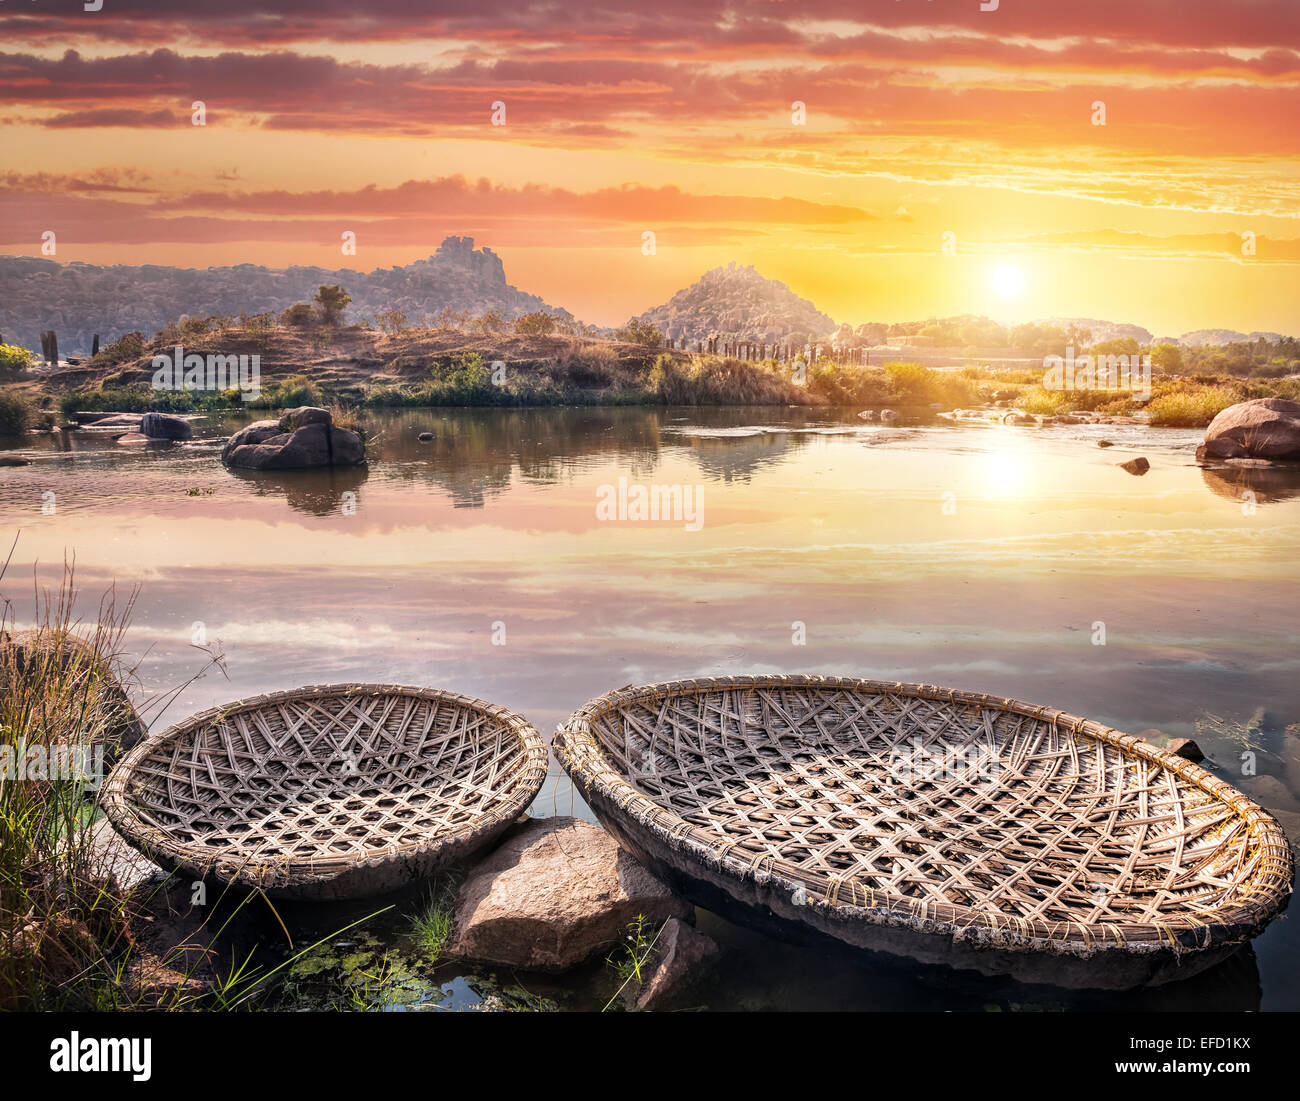 Forma redonda de botes en el río Tungabhadra en sunset sky en Hampi, Karnataka, India Imagen De Stock